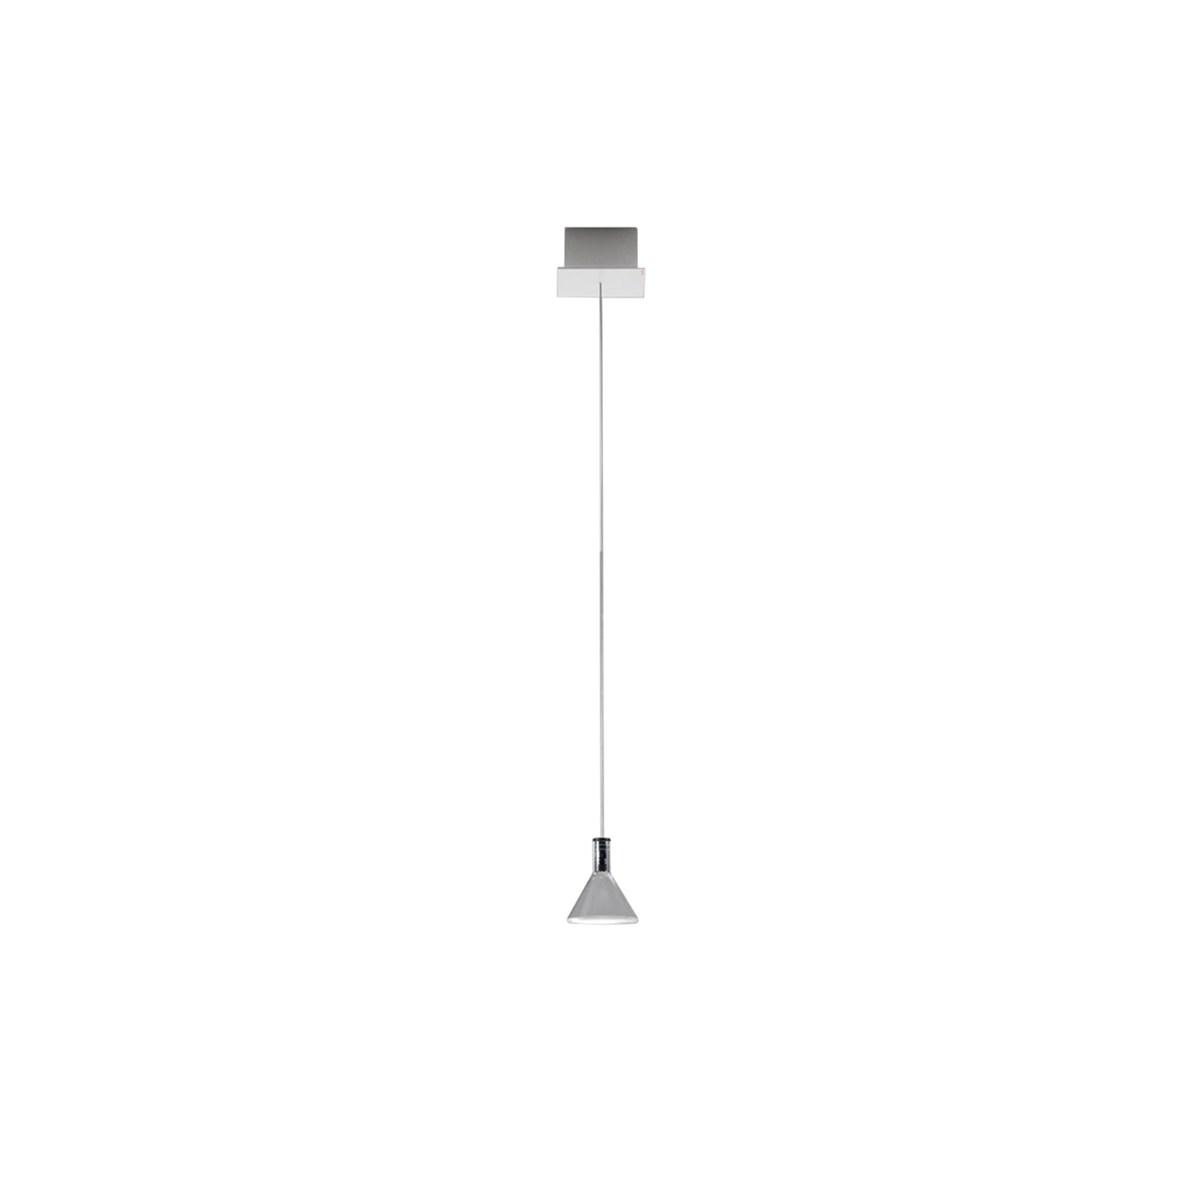 Fabbian-Marc-Sadler-Multispot-Polair-Pendant-Light-Matisse-1